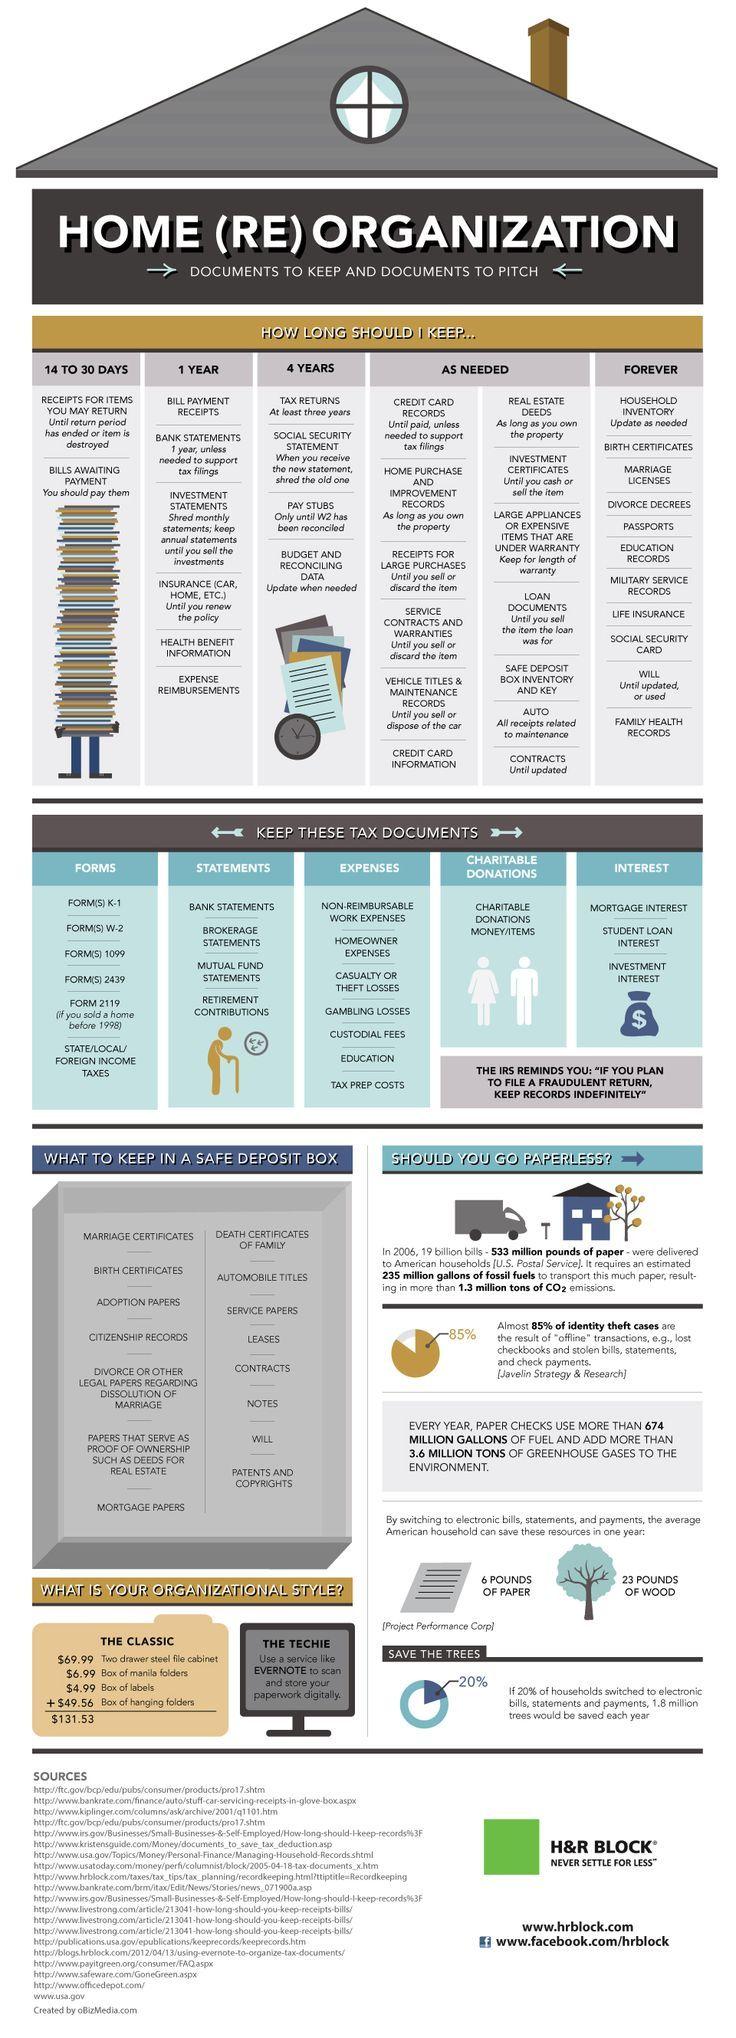 Home ReOrganization Infographic